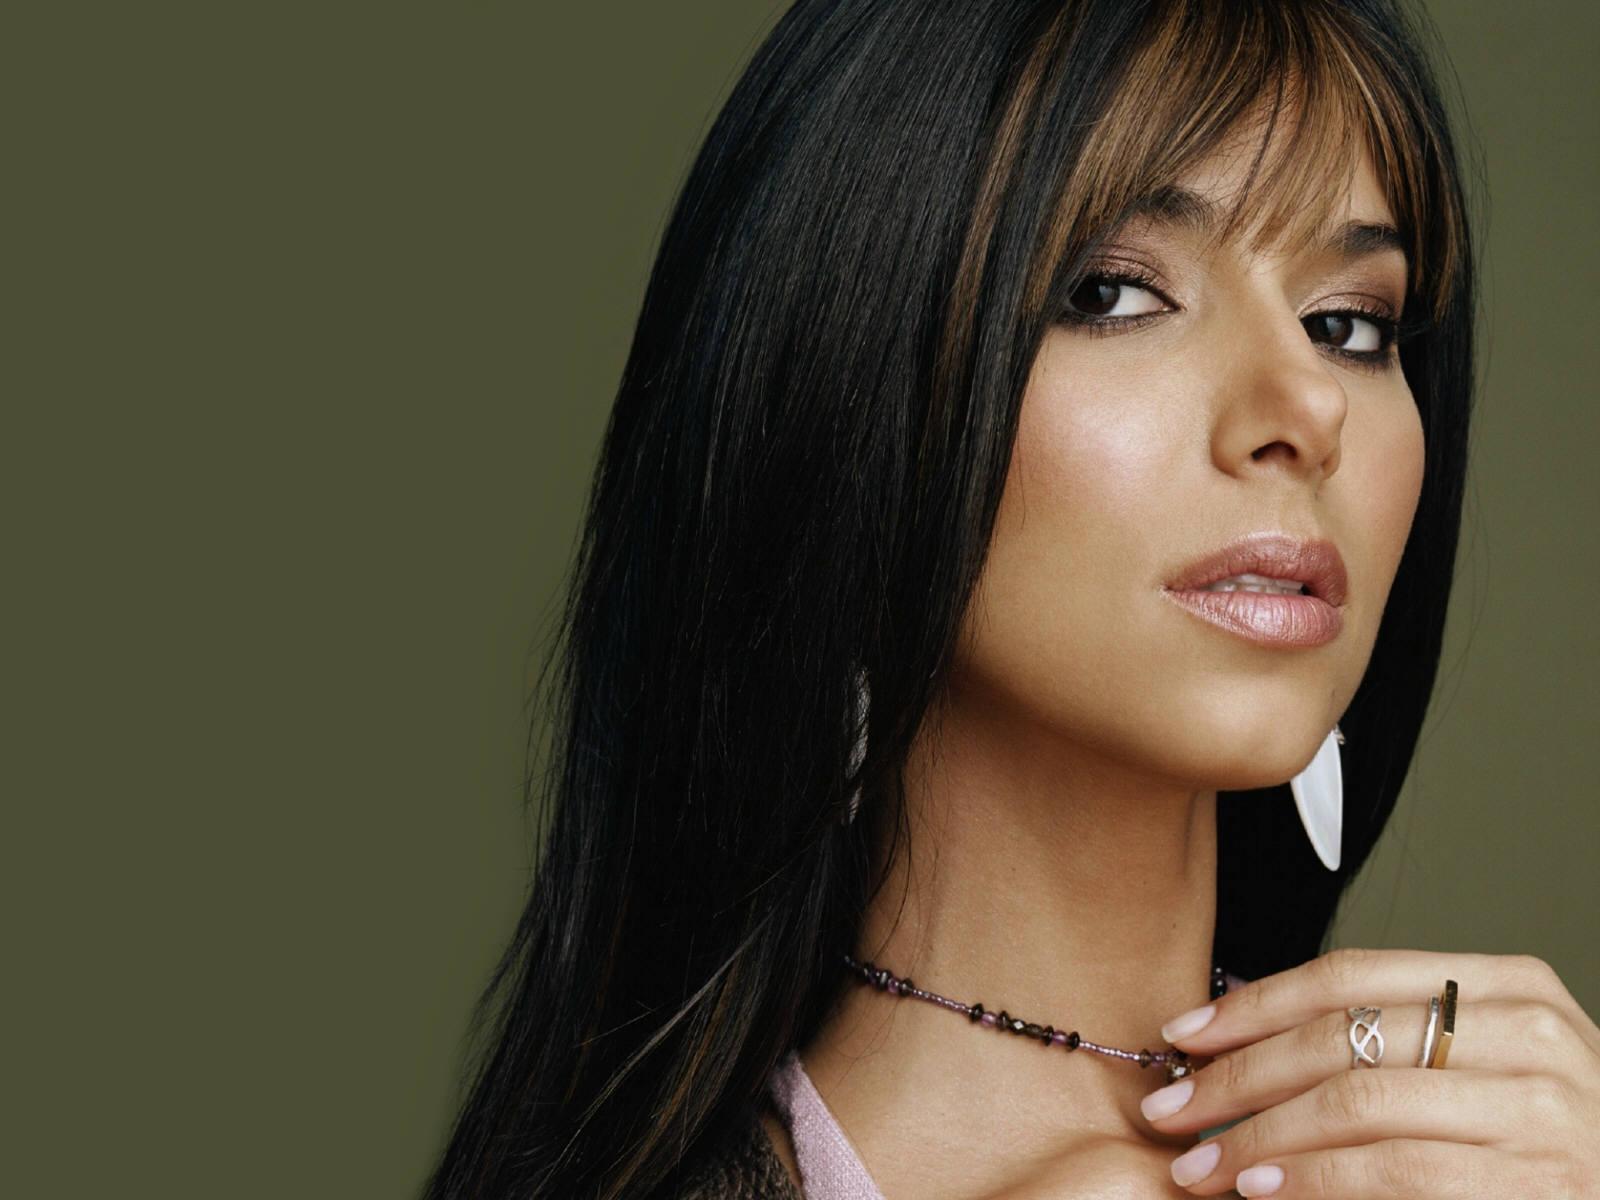 Free Wallpapers: Celebrity Wallpaper Roselyn Sanchez